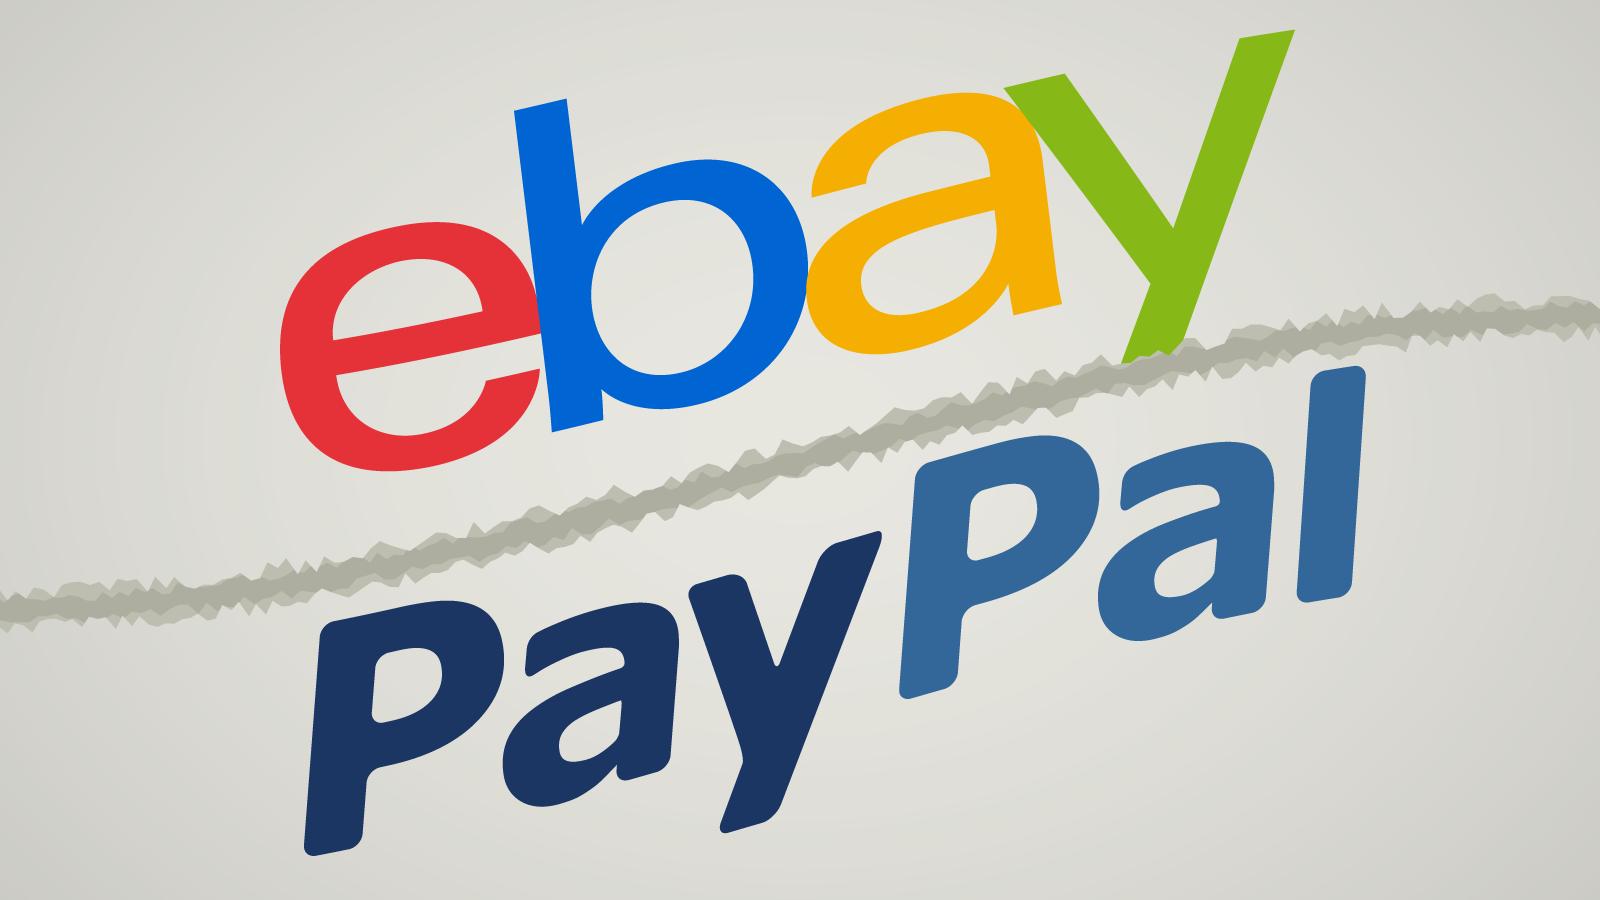 Paypal.Ed